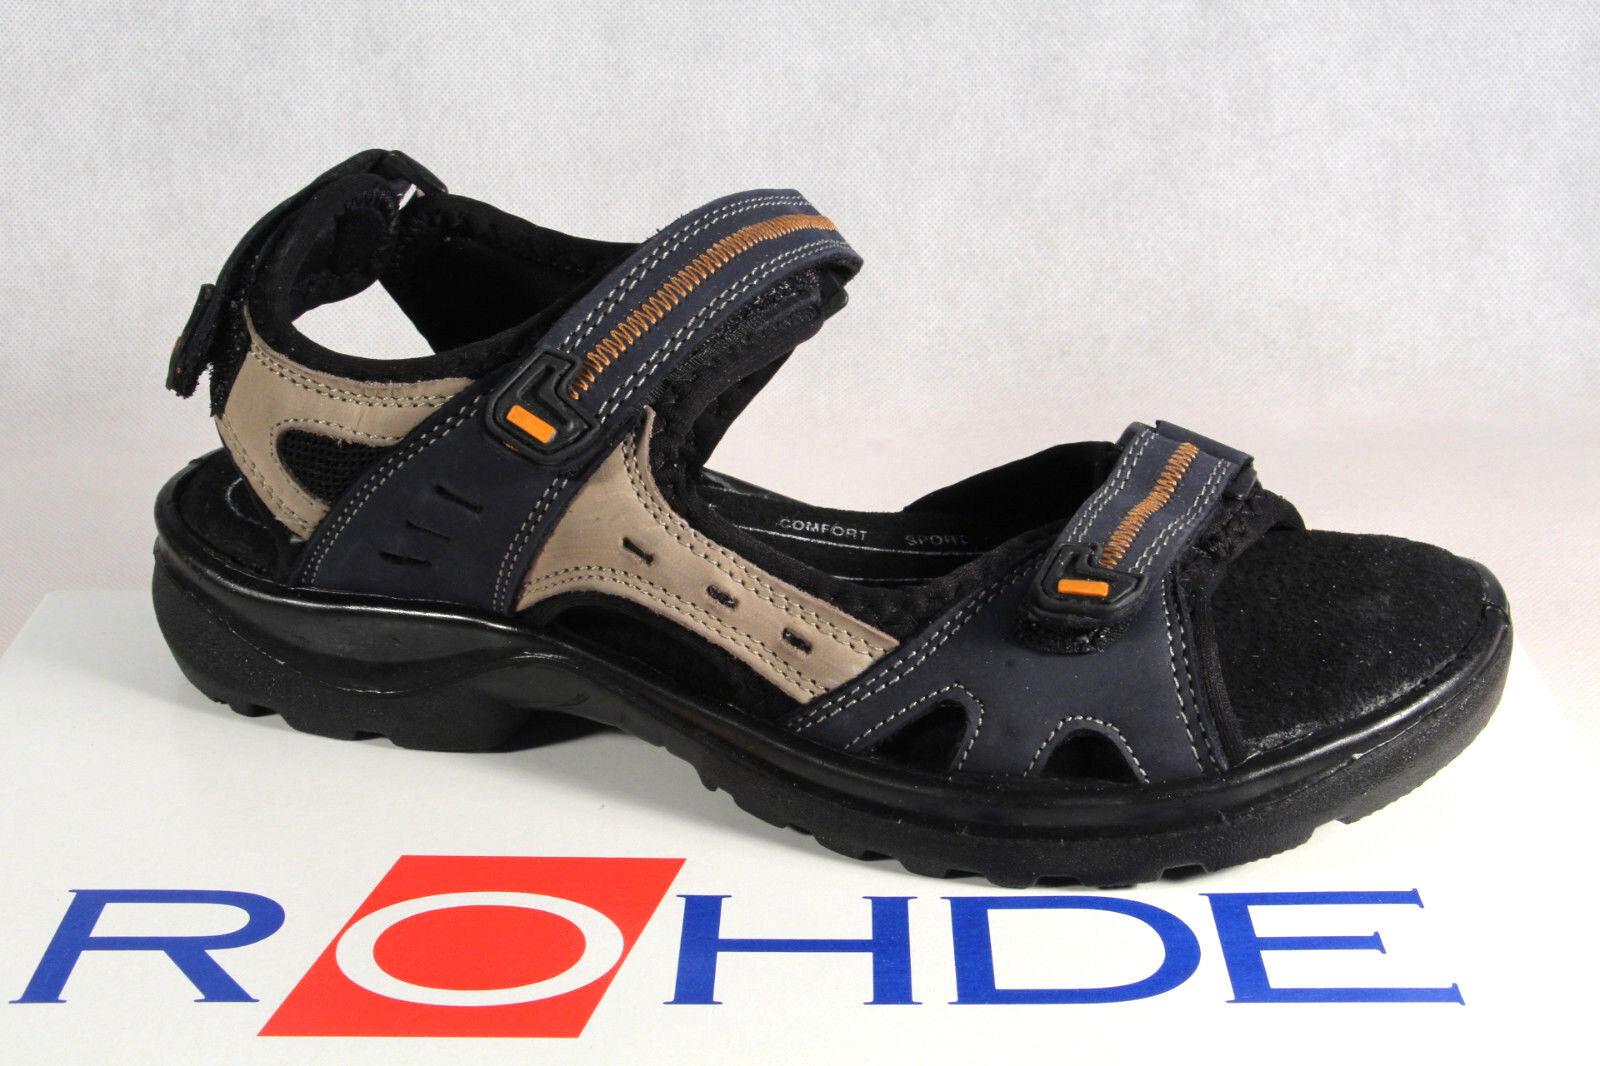 Rohde Damen Sandale Sandalen Sandaletten Weite G blau NEU